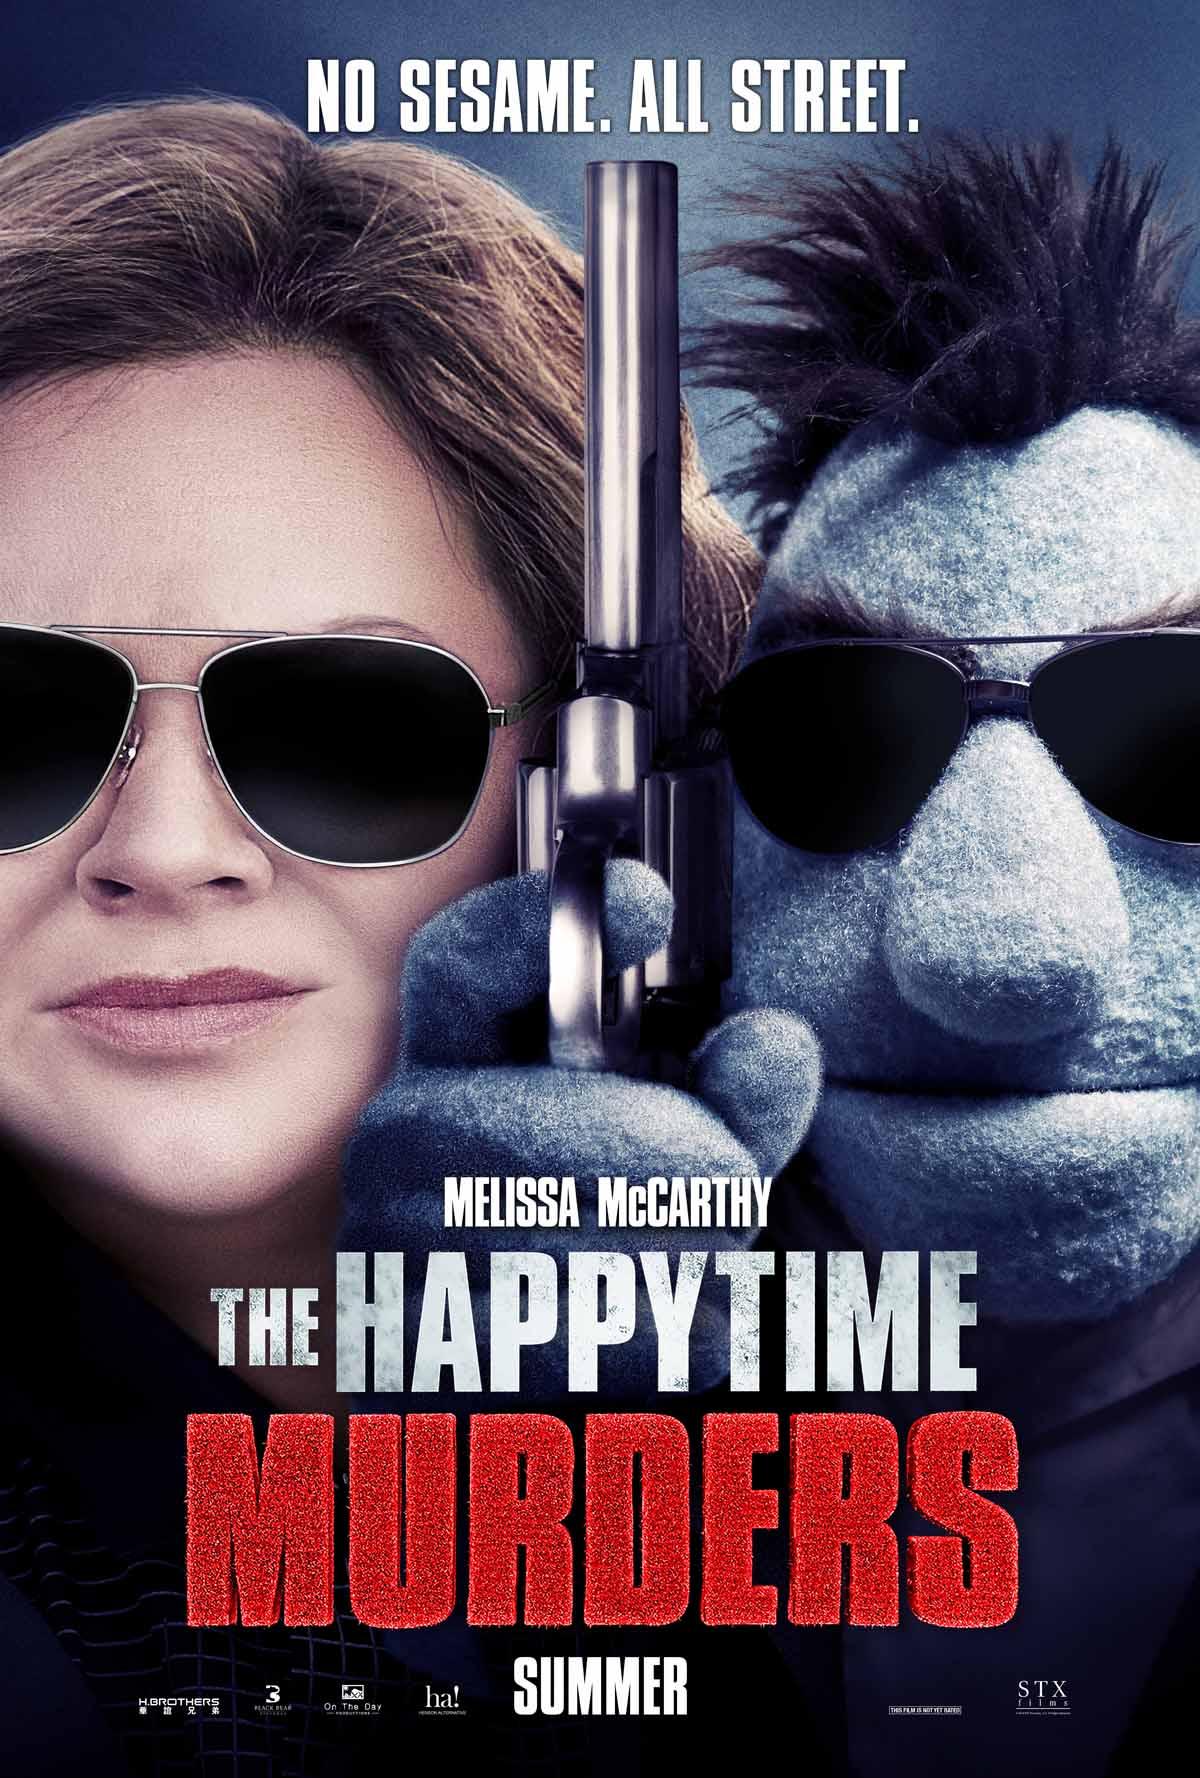 the-happytime-murders-349543id2_happytimemurders_27x40_1-sht_rgb.jpg